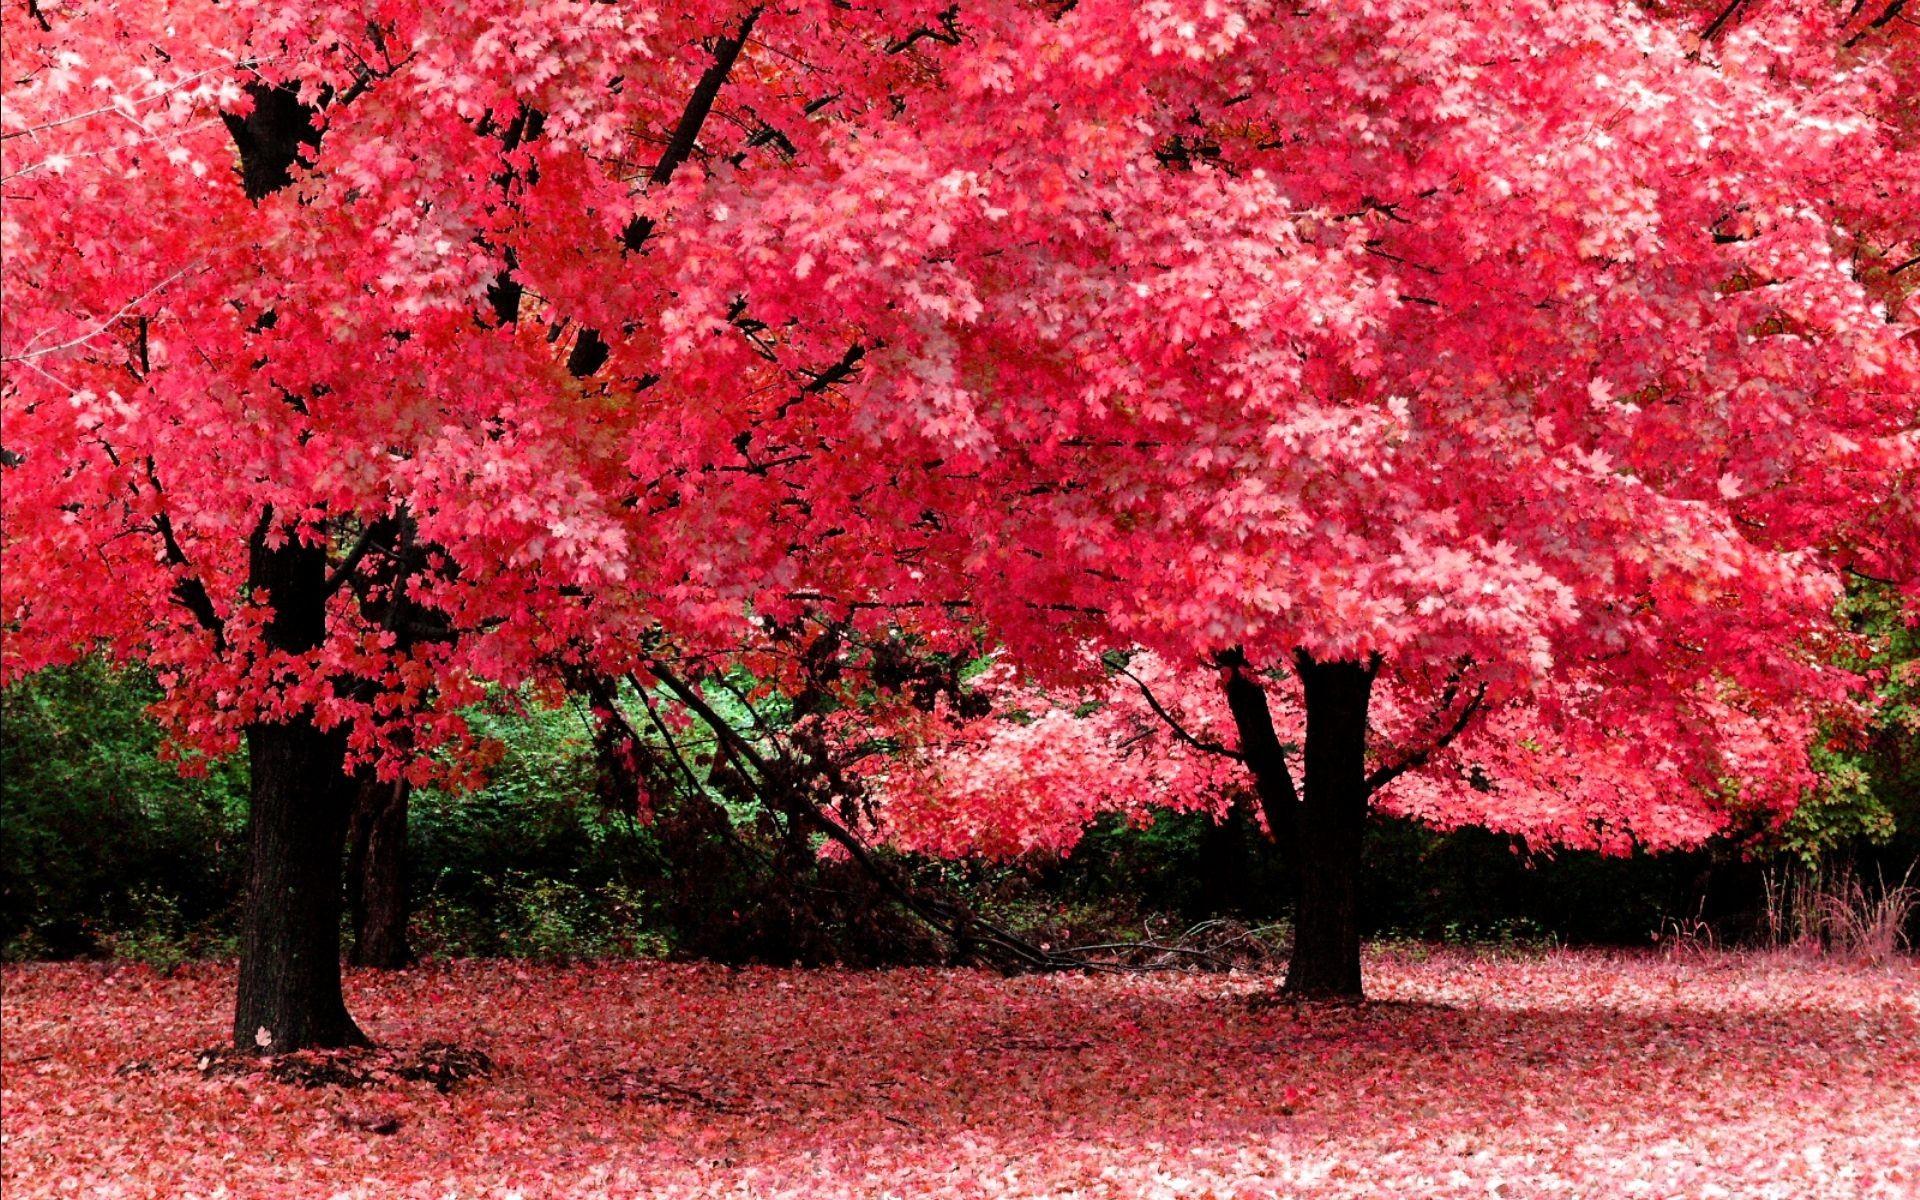 Inspirational Beautiful Nature Wallpaper Free Download For Mobile Wallpaper Laptop